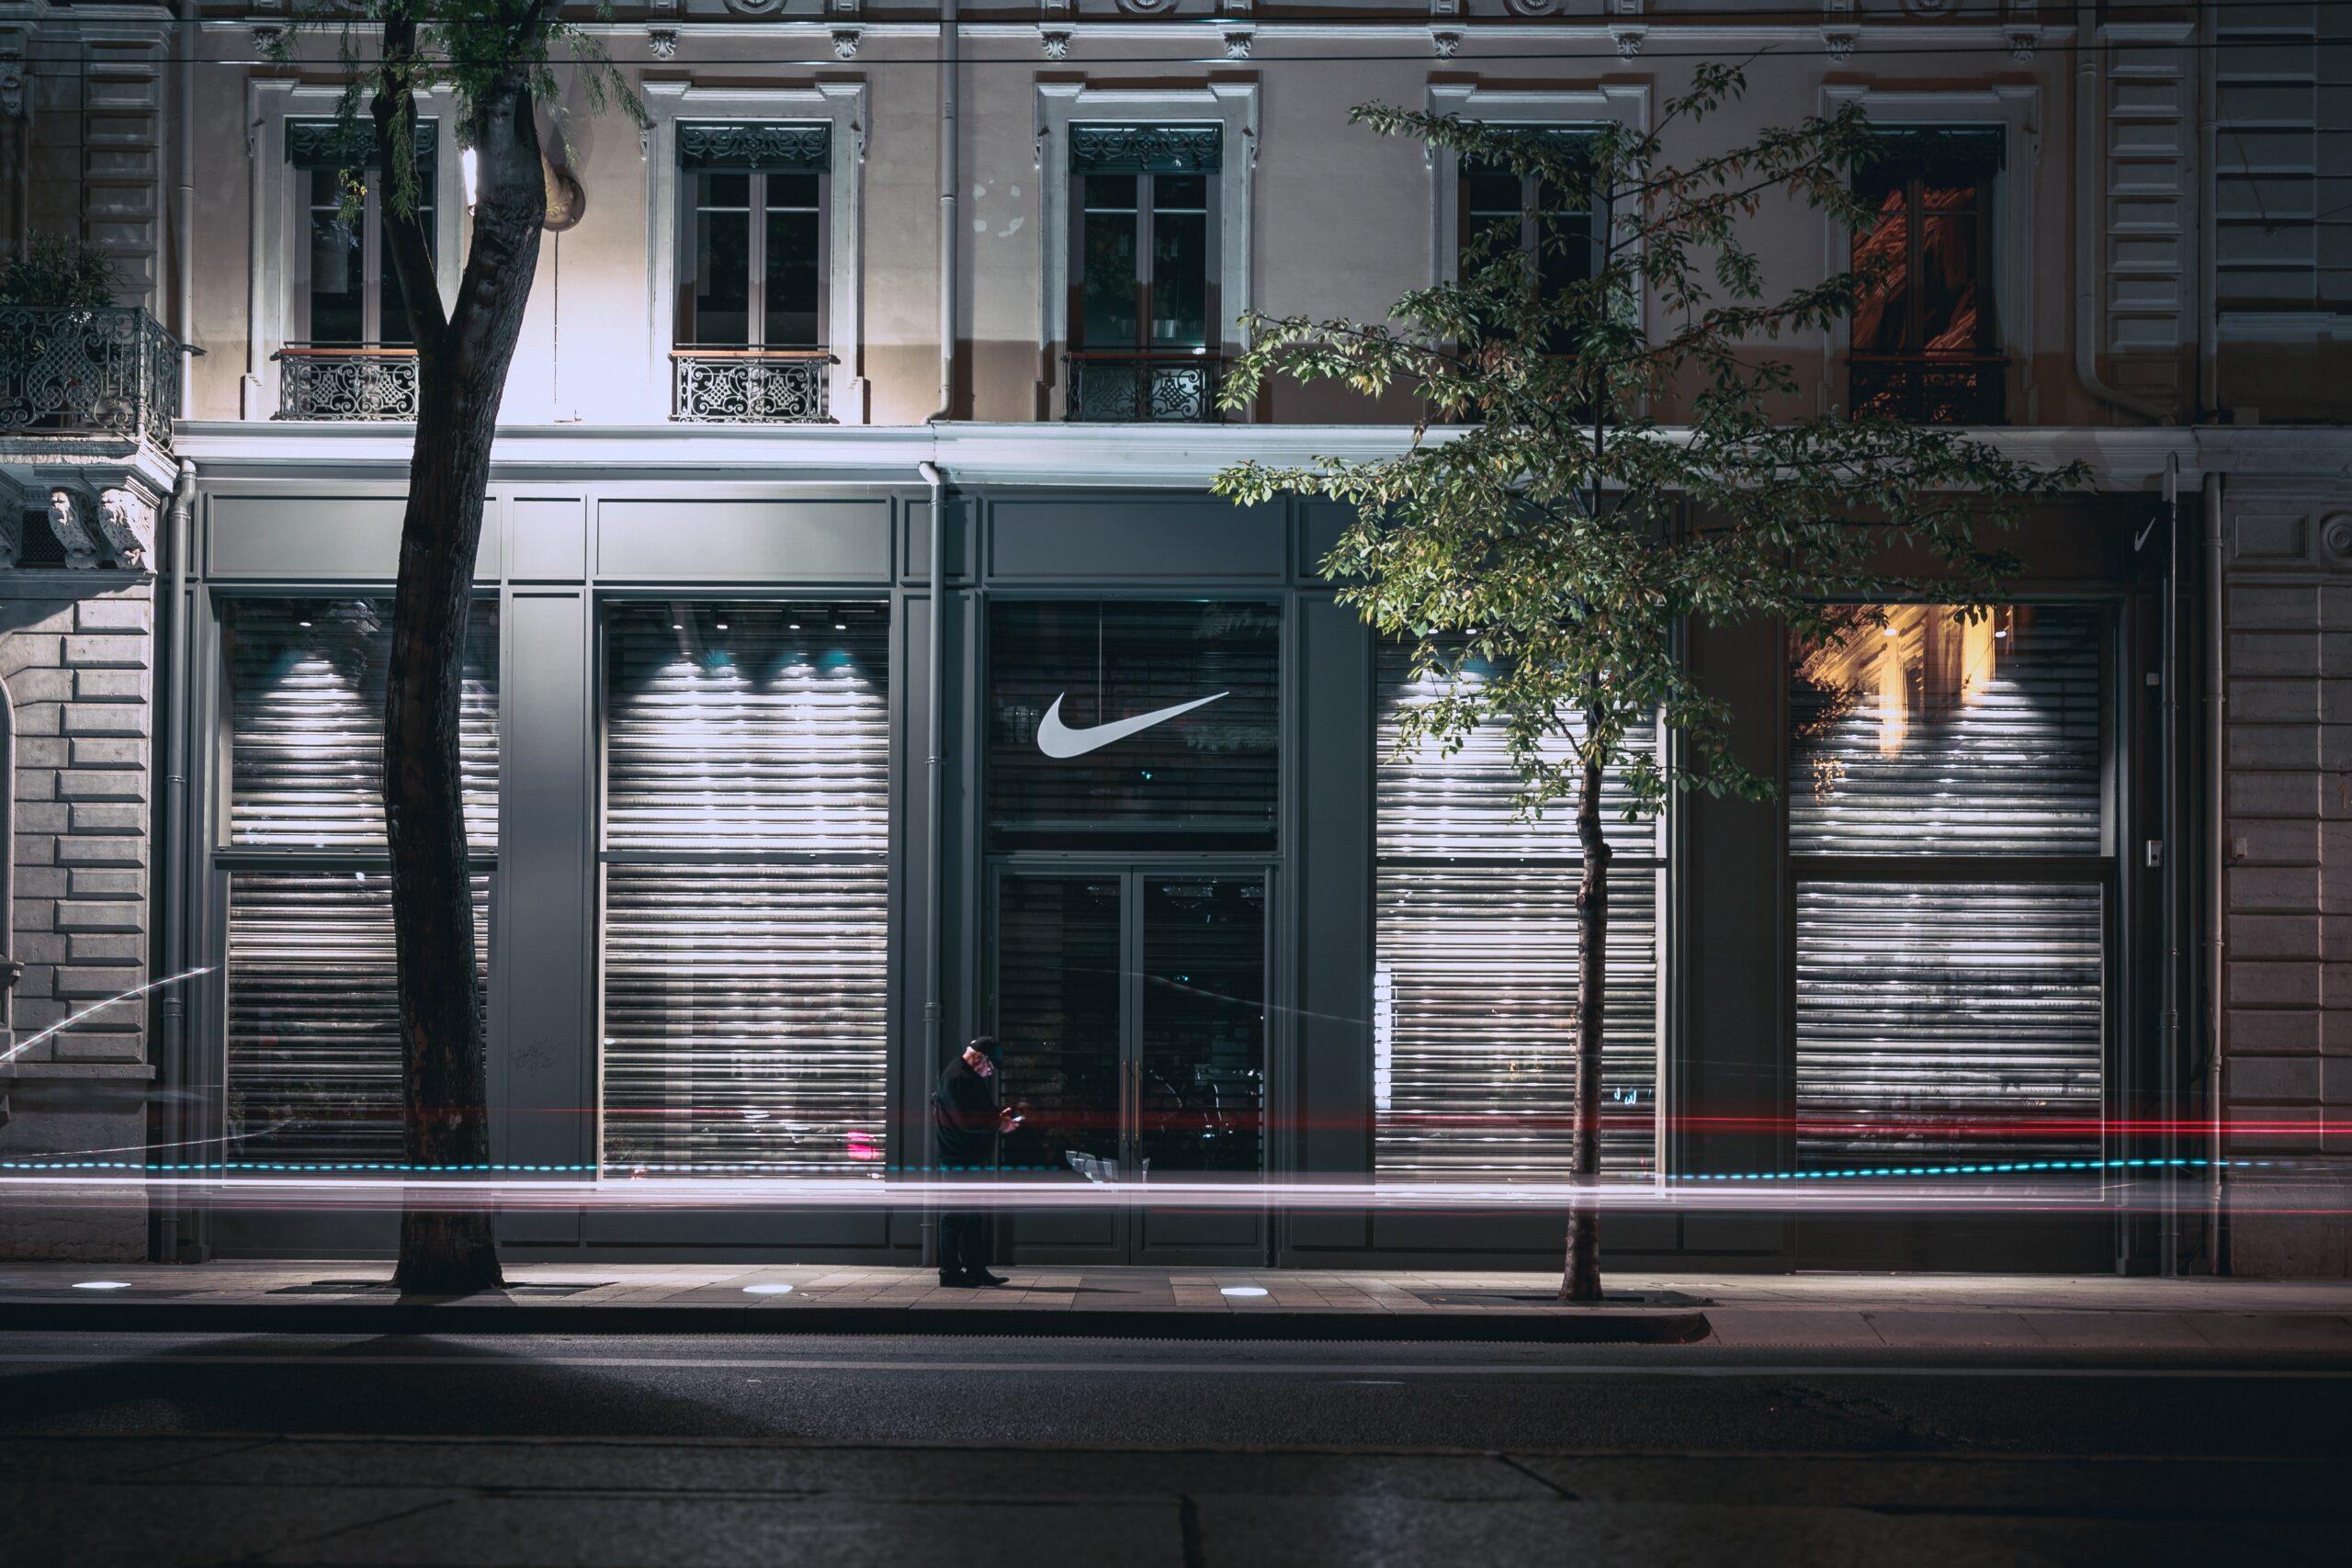 Tienda Nike scaled